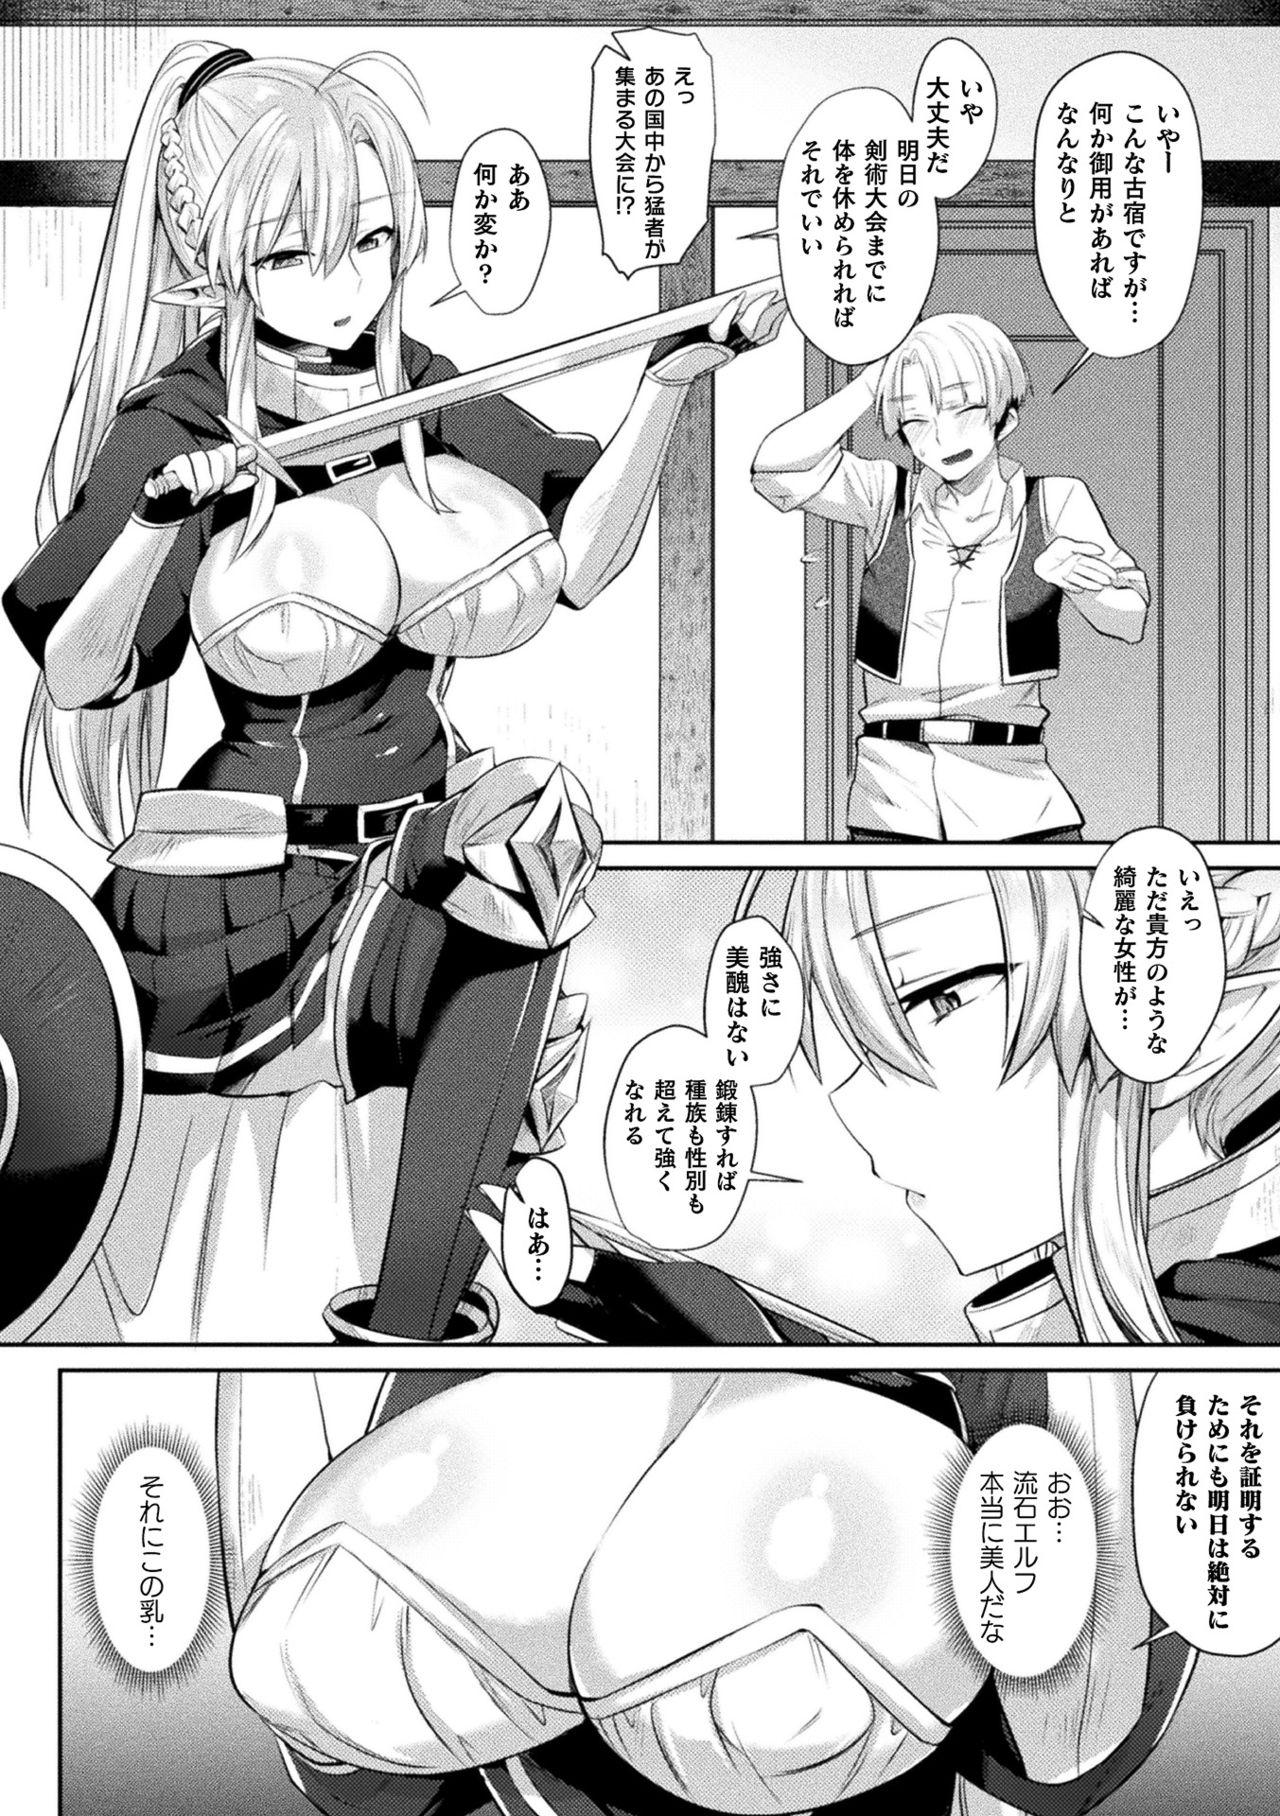 2D Comic Magazine Ero Chishiki 0 na Heroine Damashite Ryoujoku Muchix! Vol. 1 3